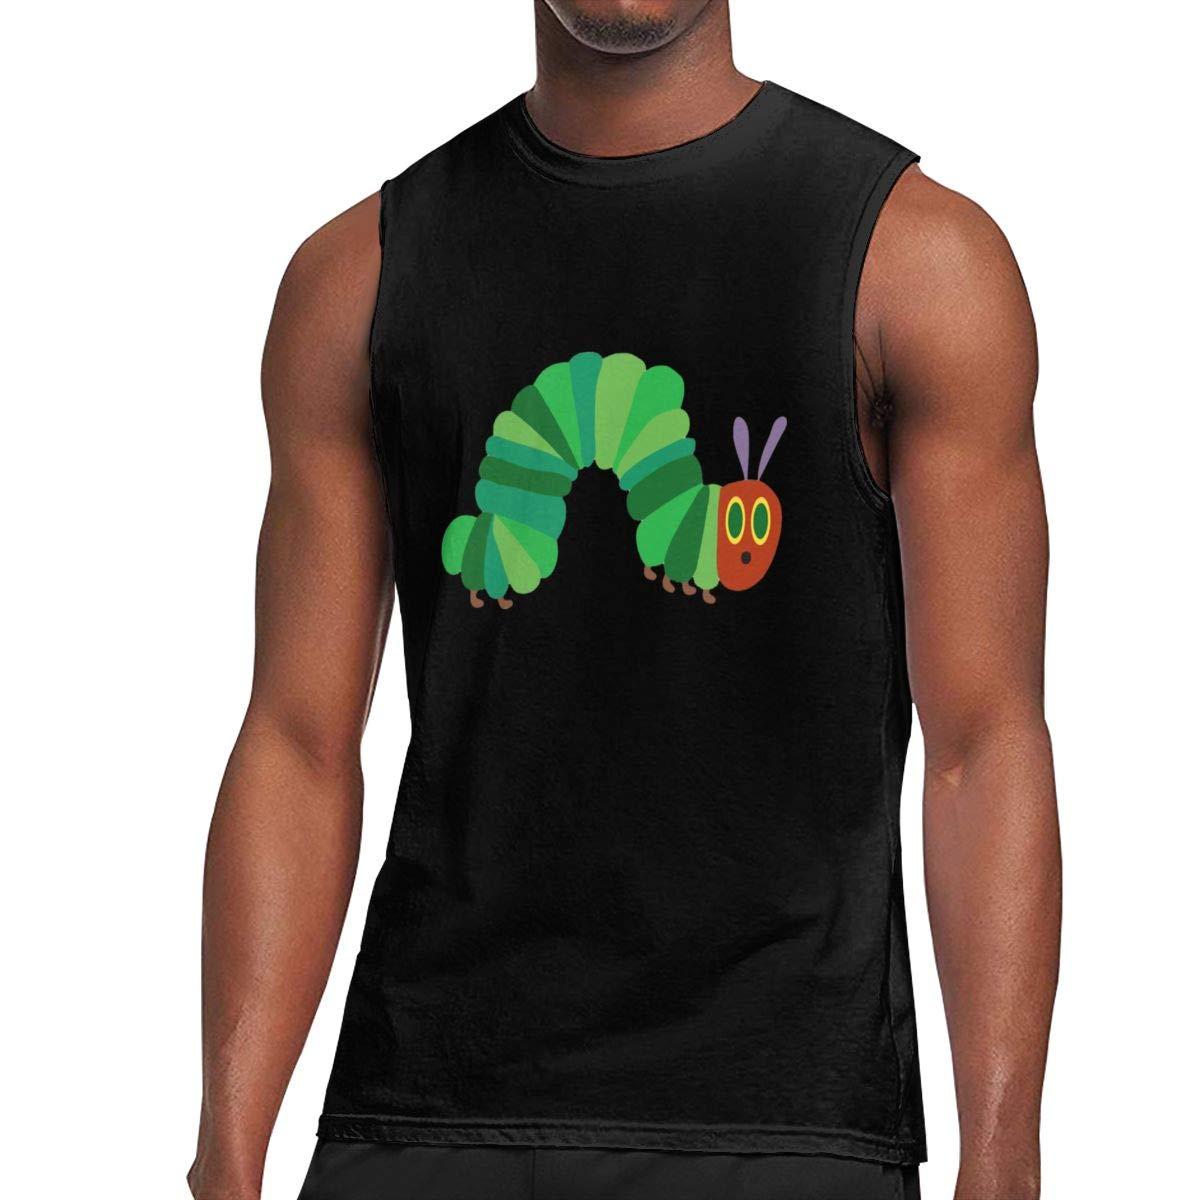 Seuriamin The Very Hungry Caterpillar S Casual Travel Sleeveless Muscle Short Sleeve Shirt